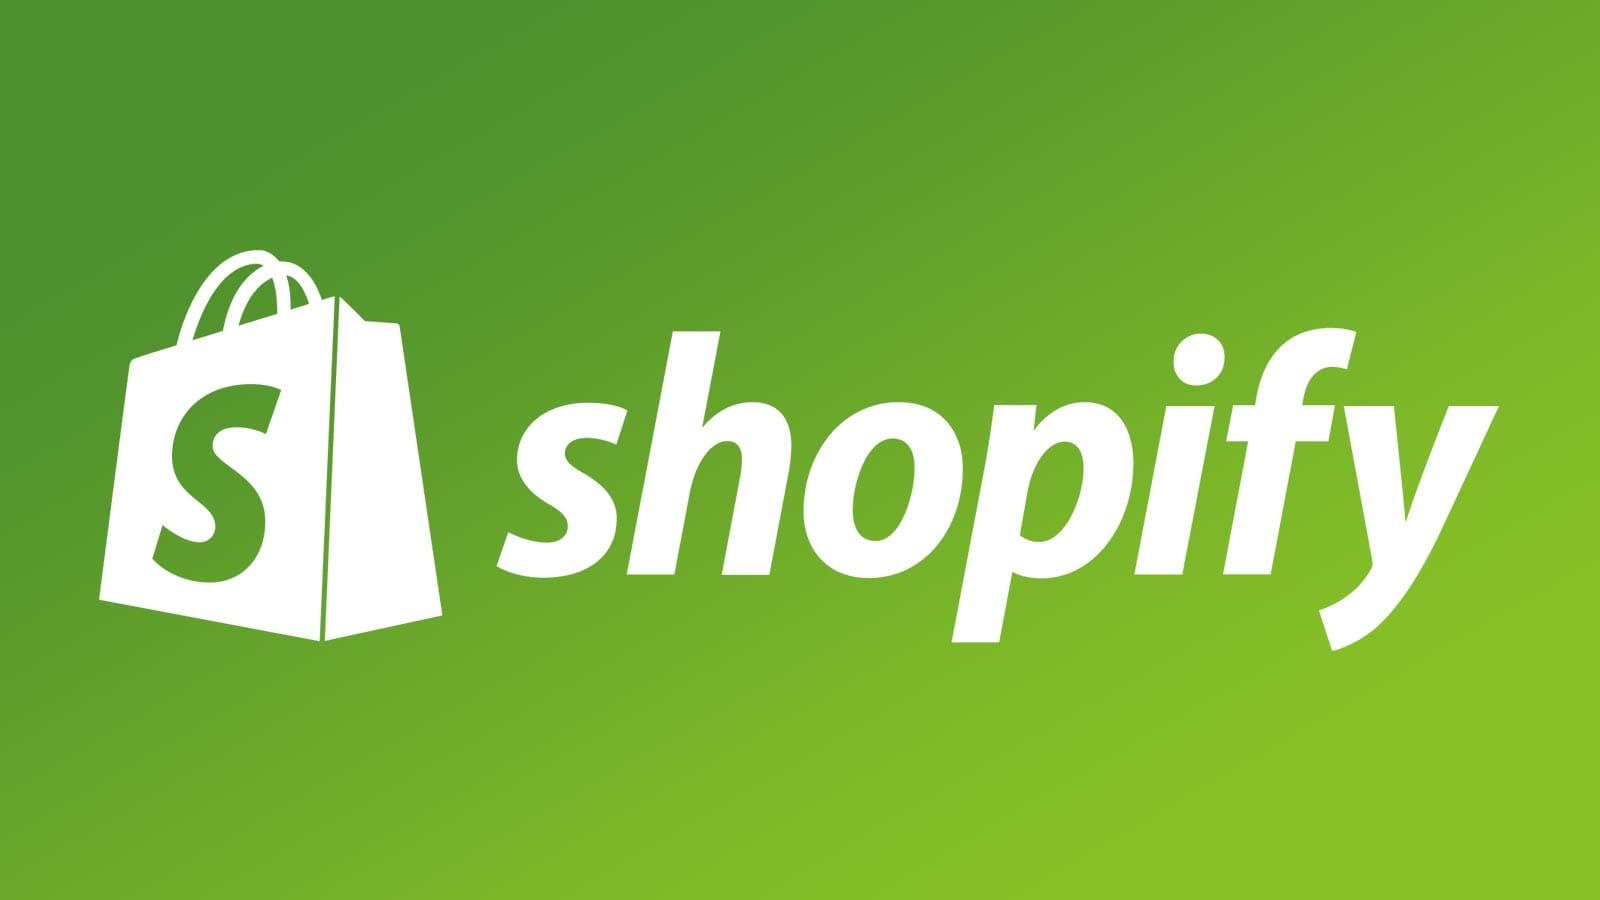 Shopify Web Services